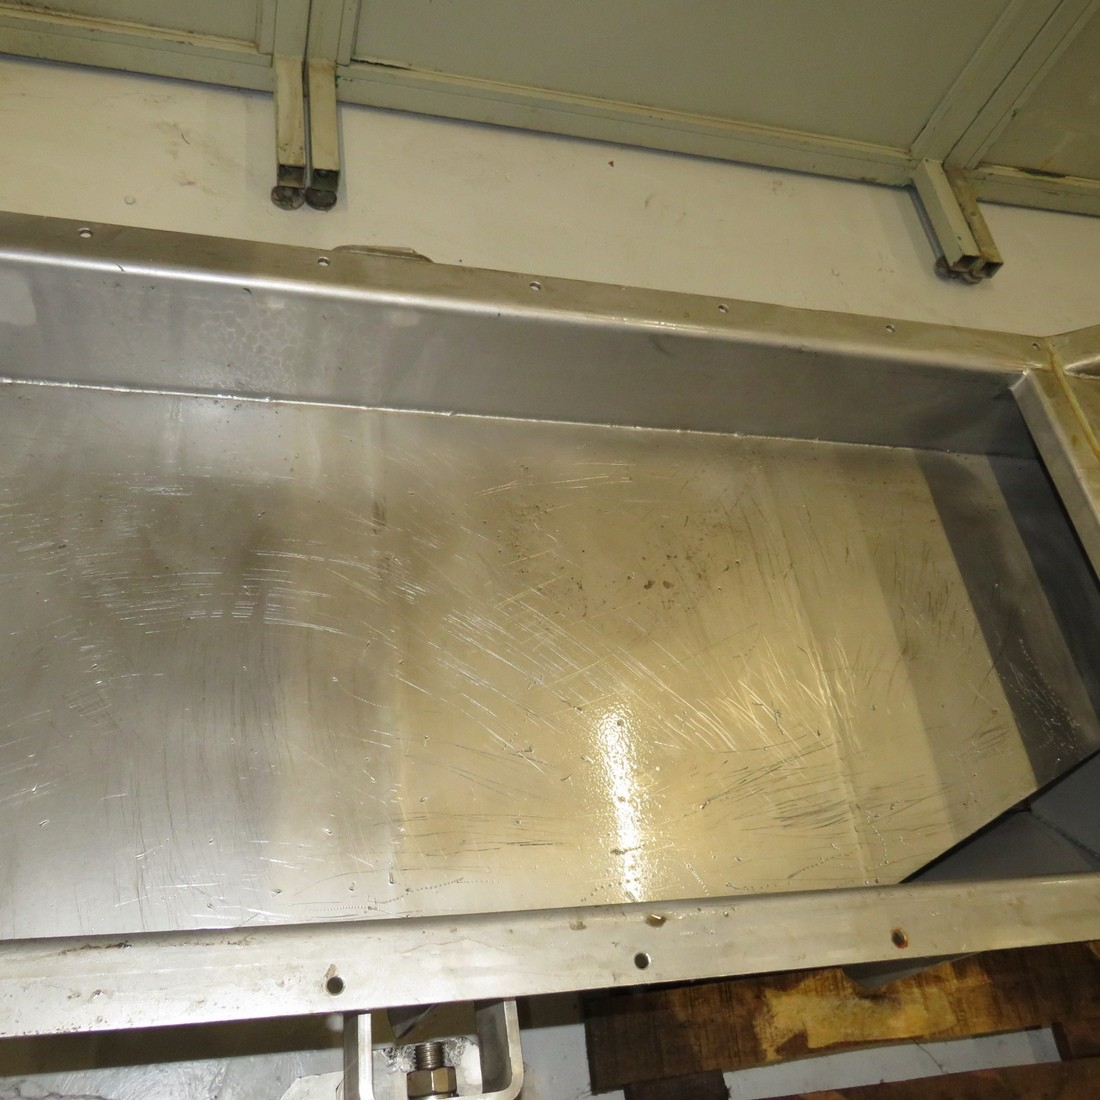 R4U79  Stainless steel SINEX Vibrating conveyor TRANSPORTEUR type